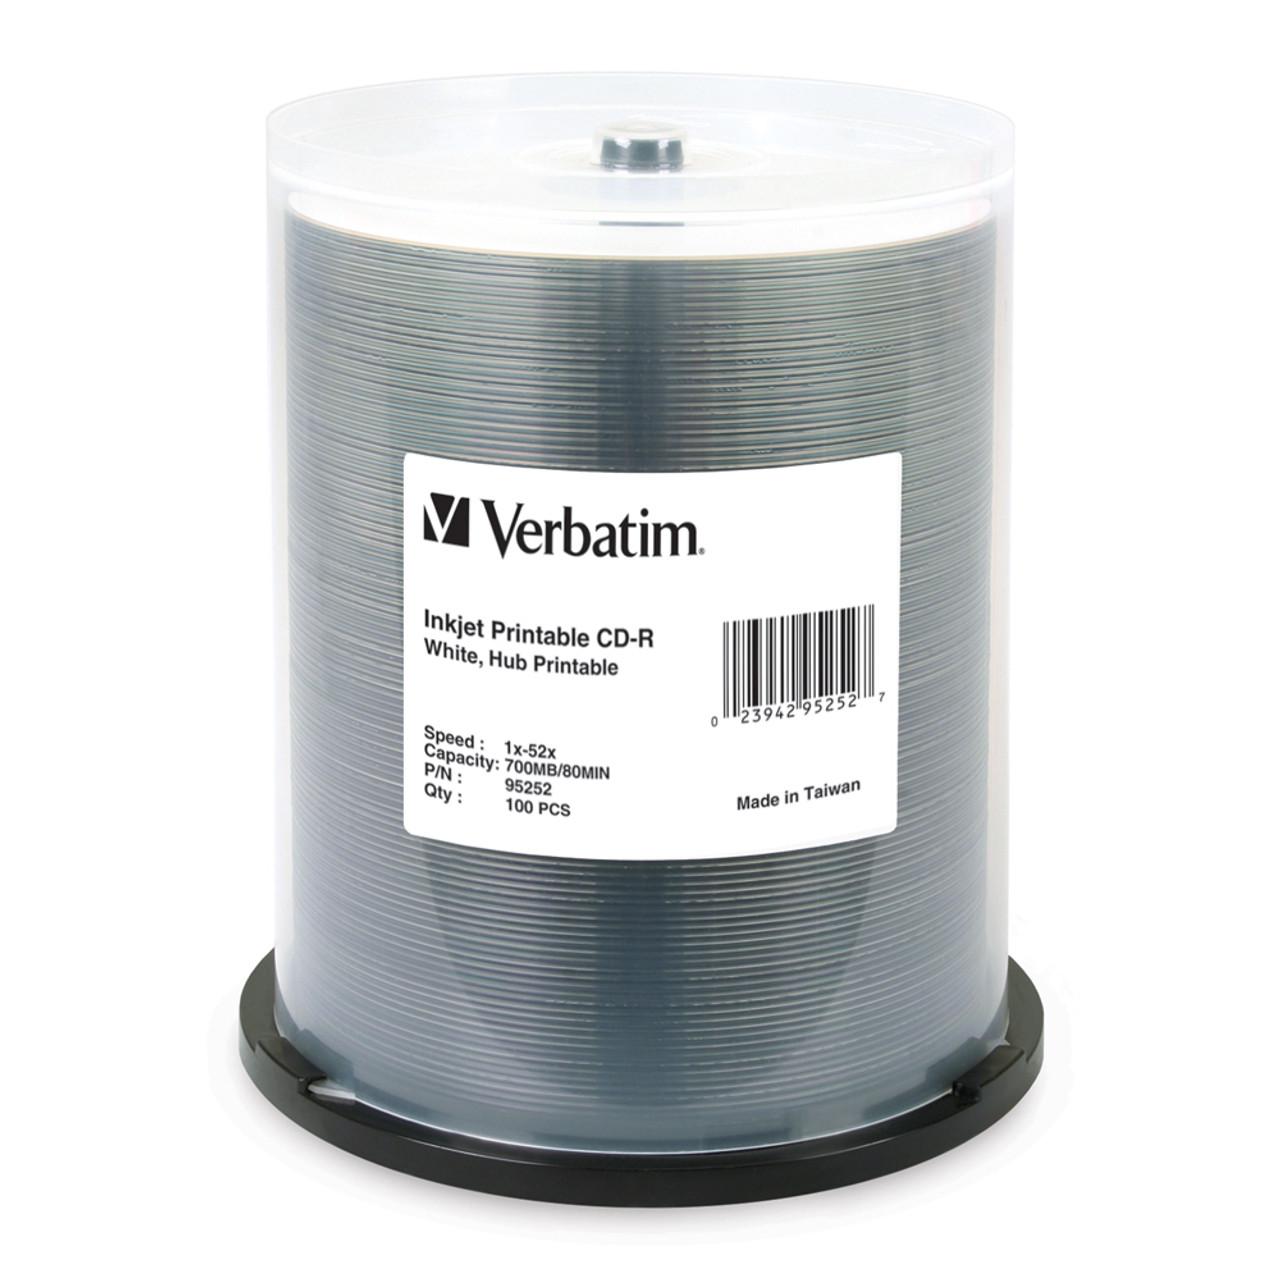 picture regarding Inkjet Printable Cds called VERBATIM 95252 CD-R INKJET PRINTABLE WHITE - 100 PACK SPINDLE